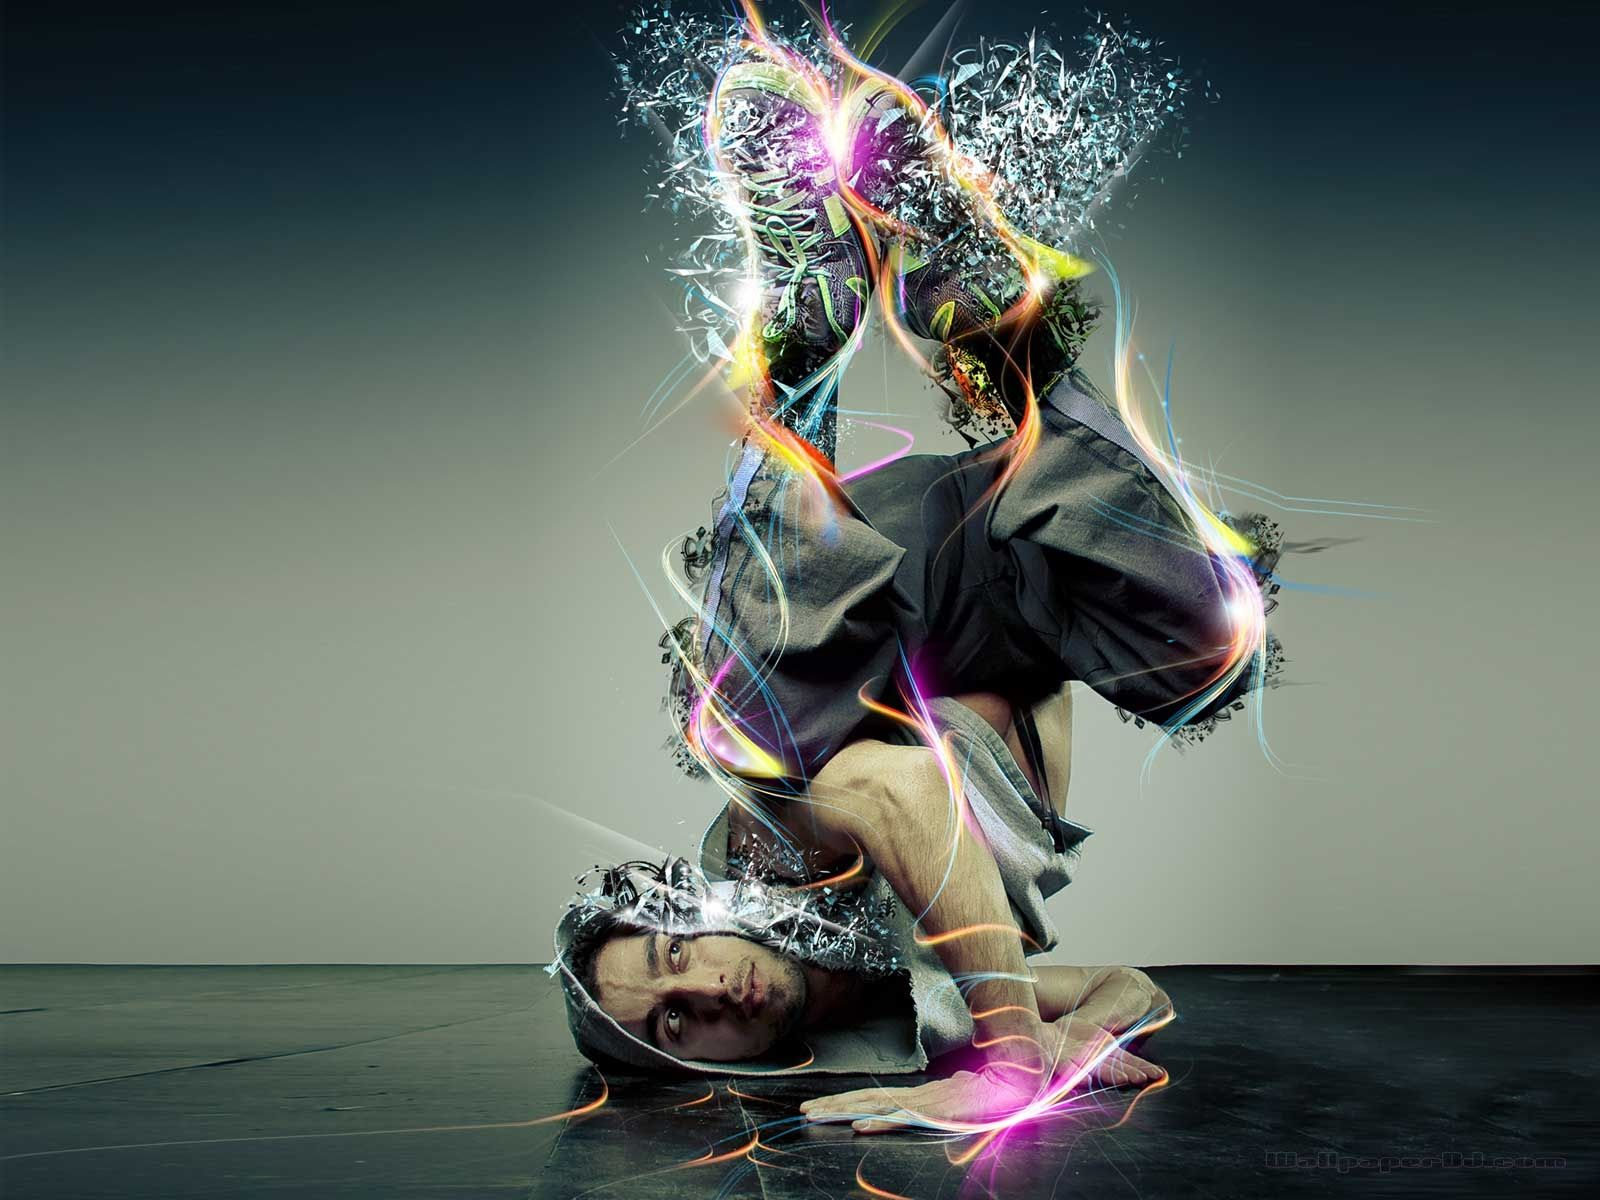 Hip hop dance pictures tumbrl the dance pinterest hip hop hip hop dance pictures tumbrl voltagebd Choice Image